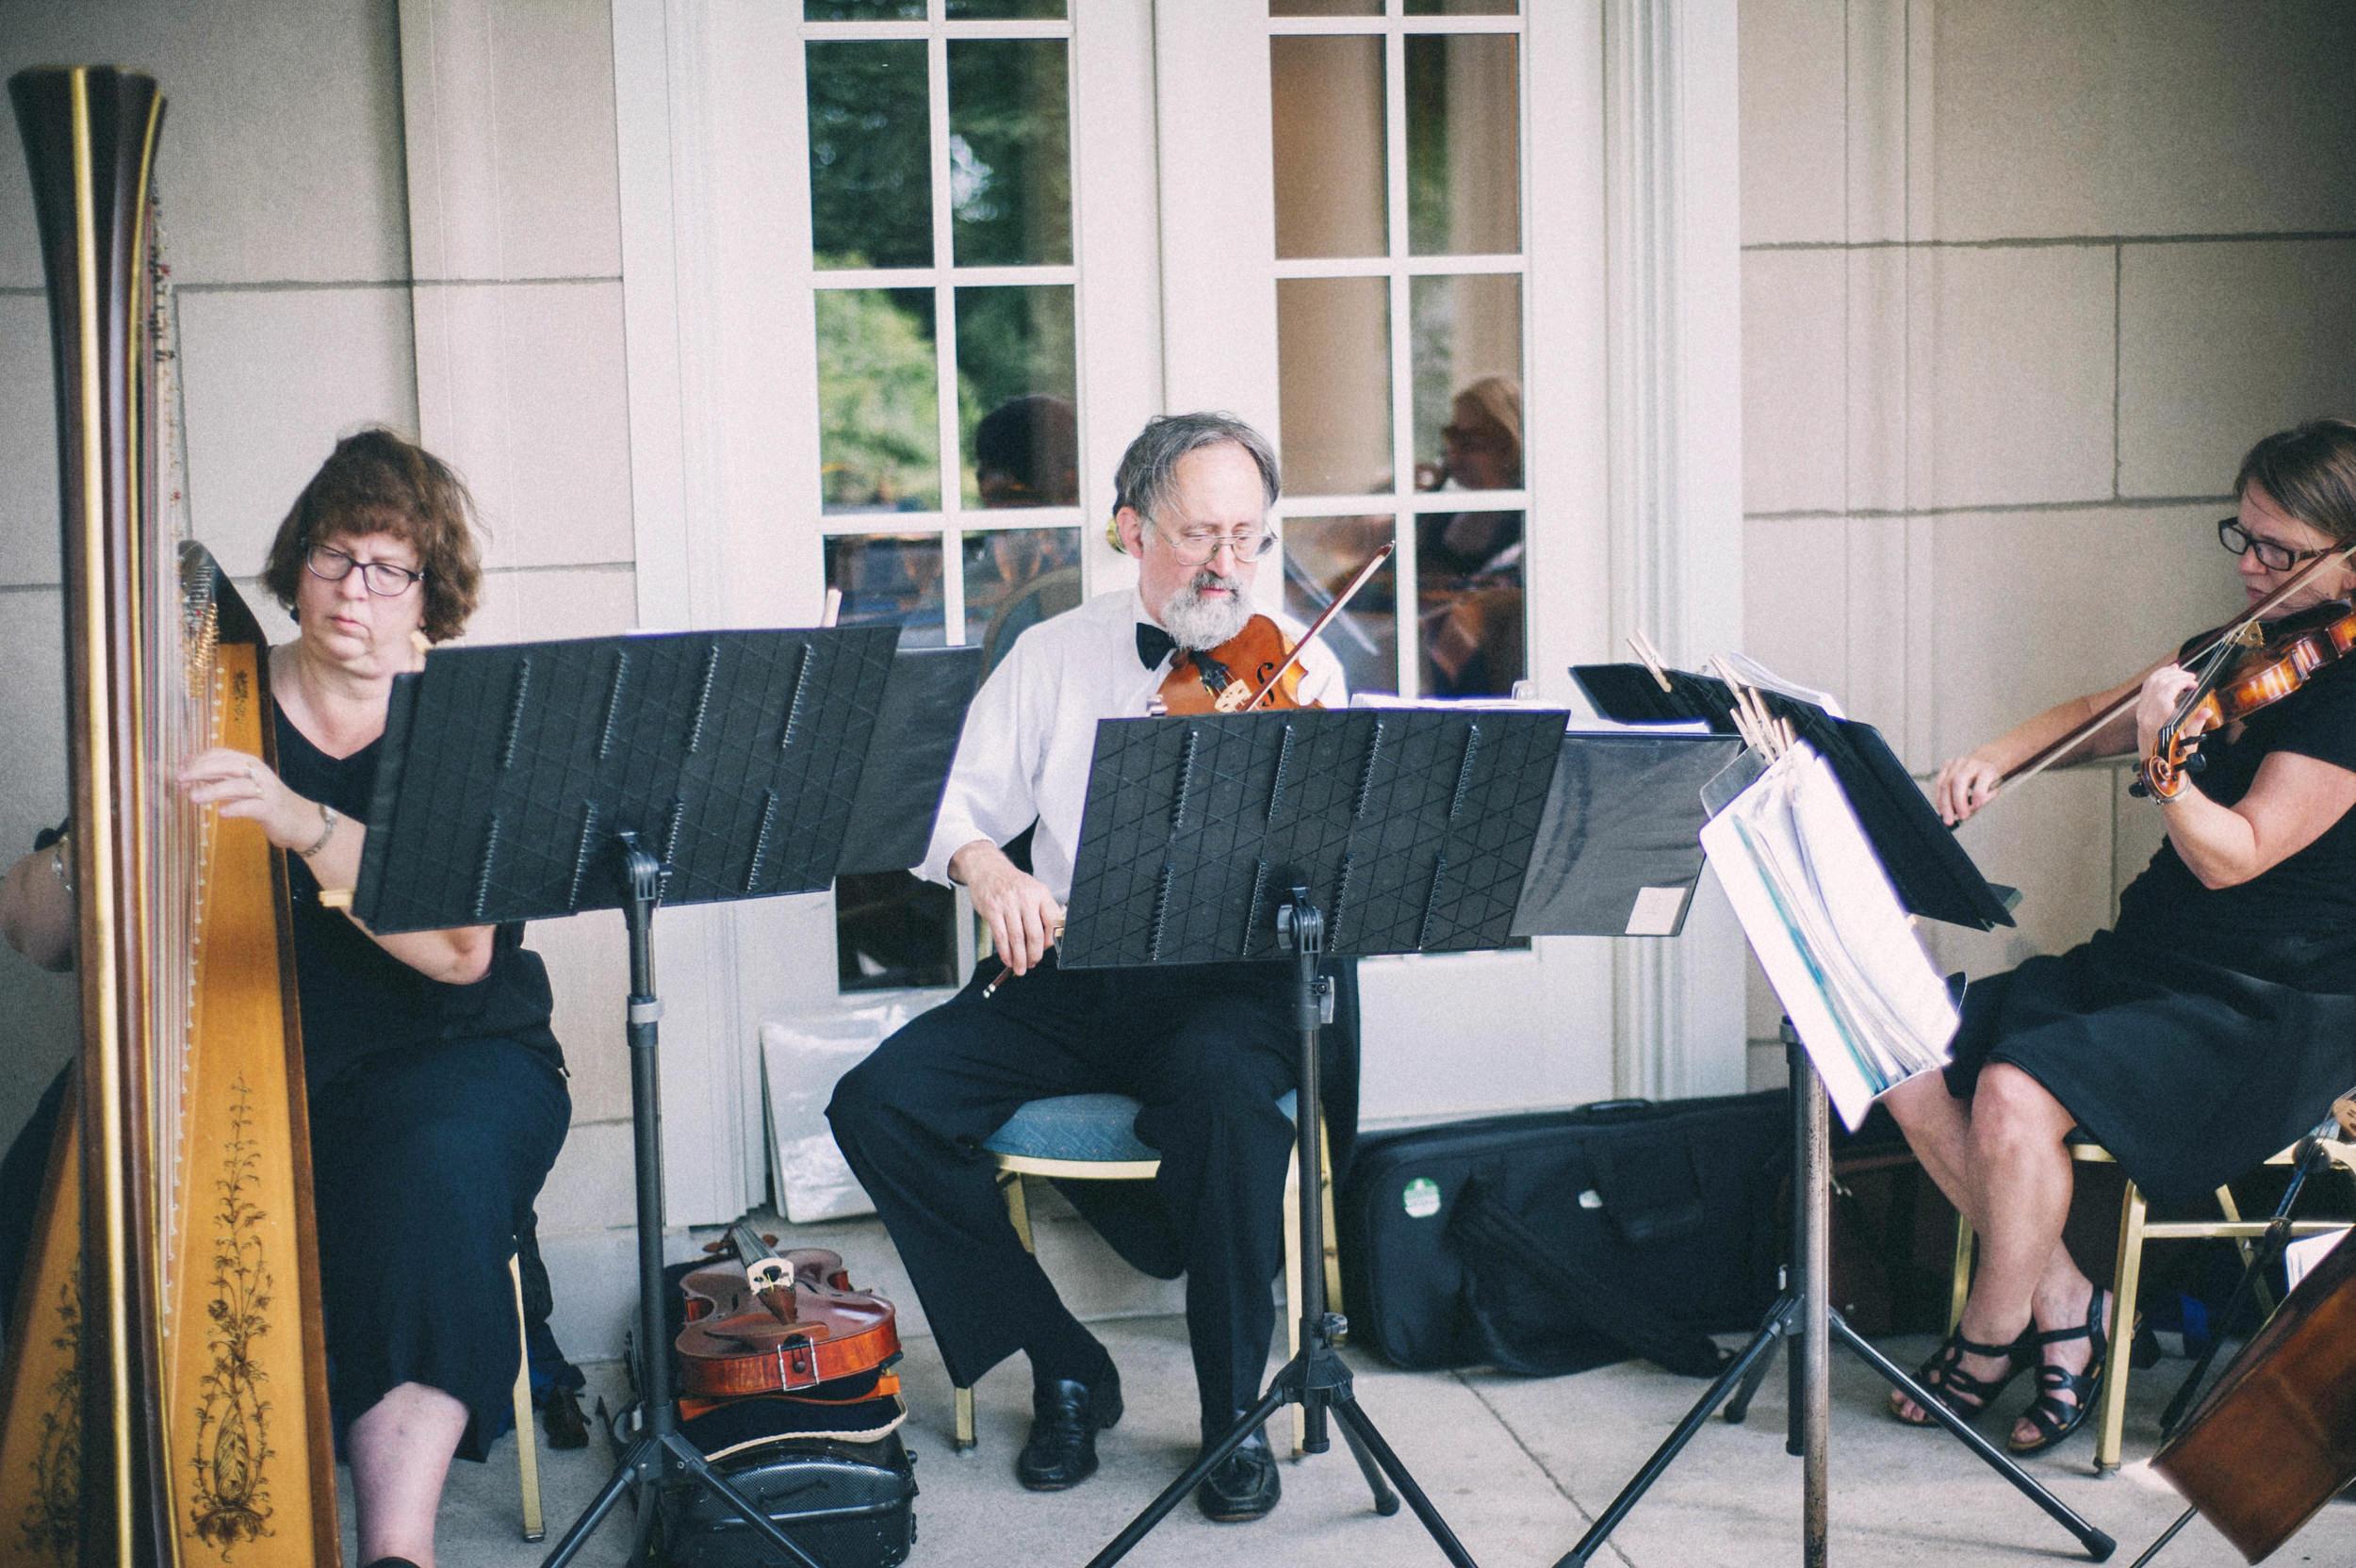 Jenna-Patrick-Garden-Court-Presbyterian-Seminary-Wedding-Louisville-Kentucky-Sarah-Katherine-Davis-Photography-54.jpg